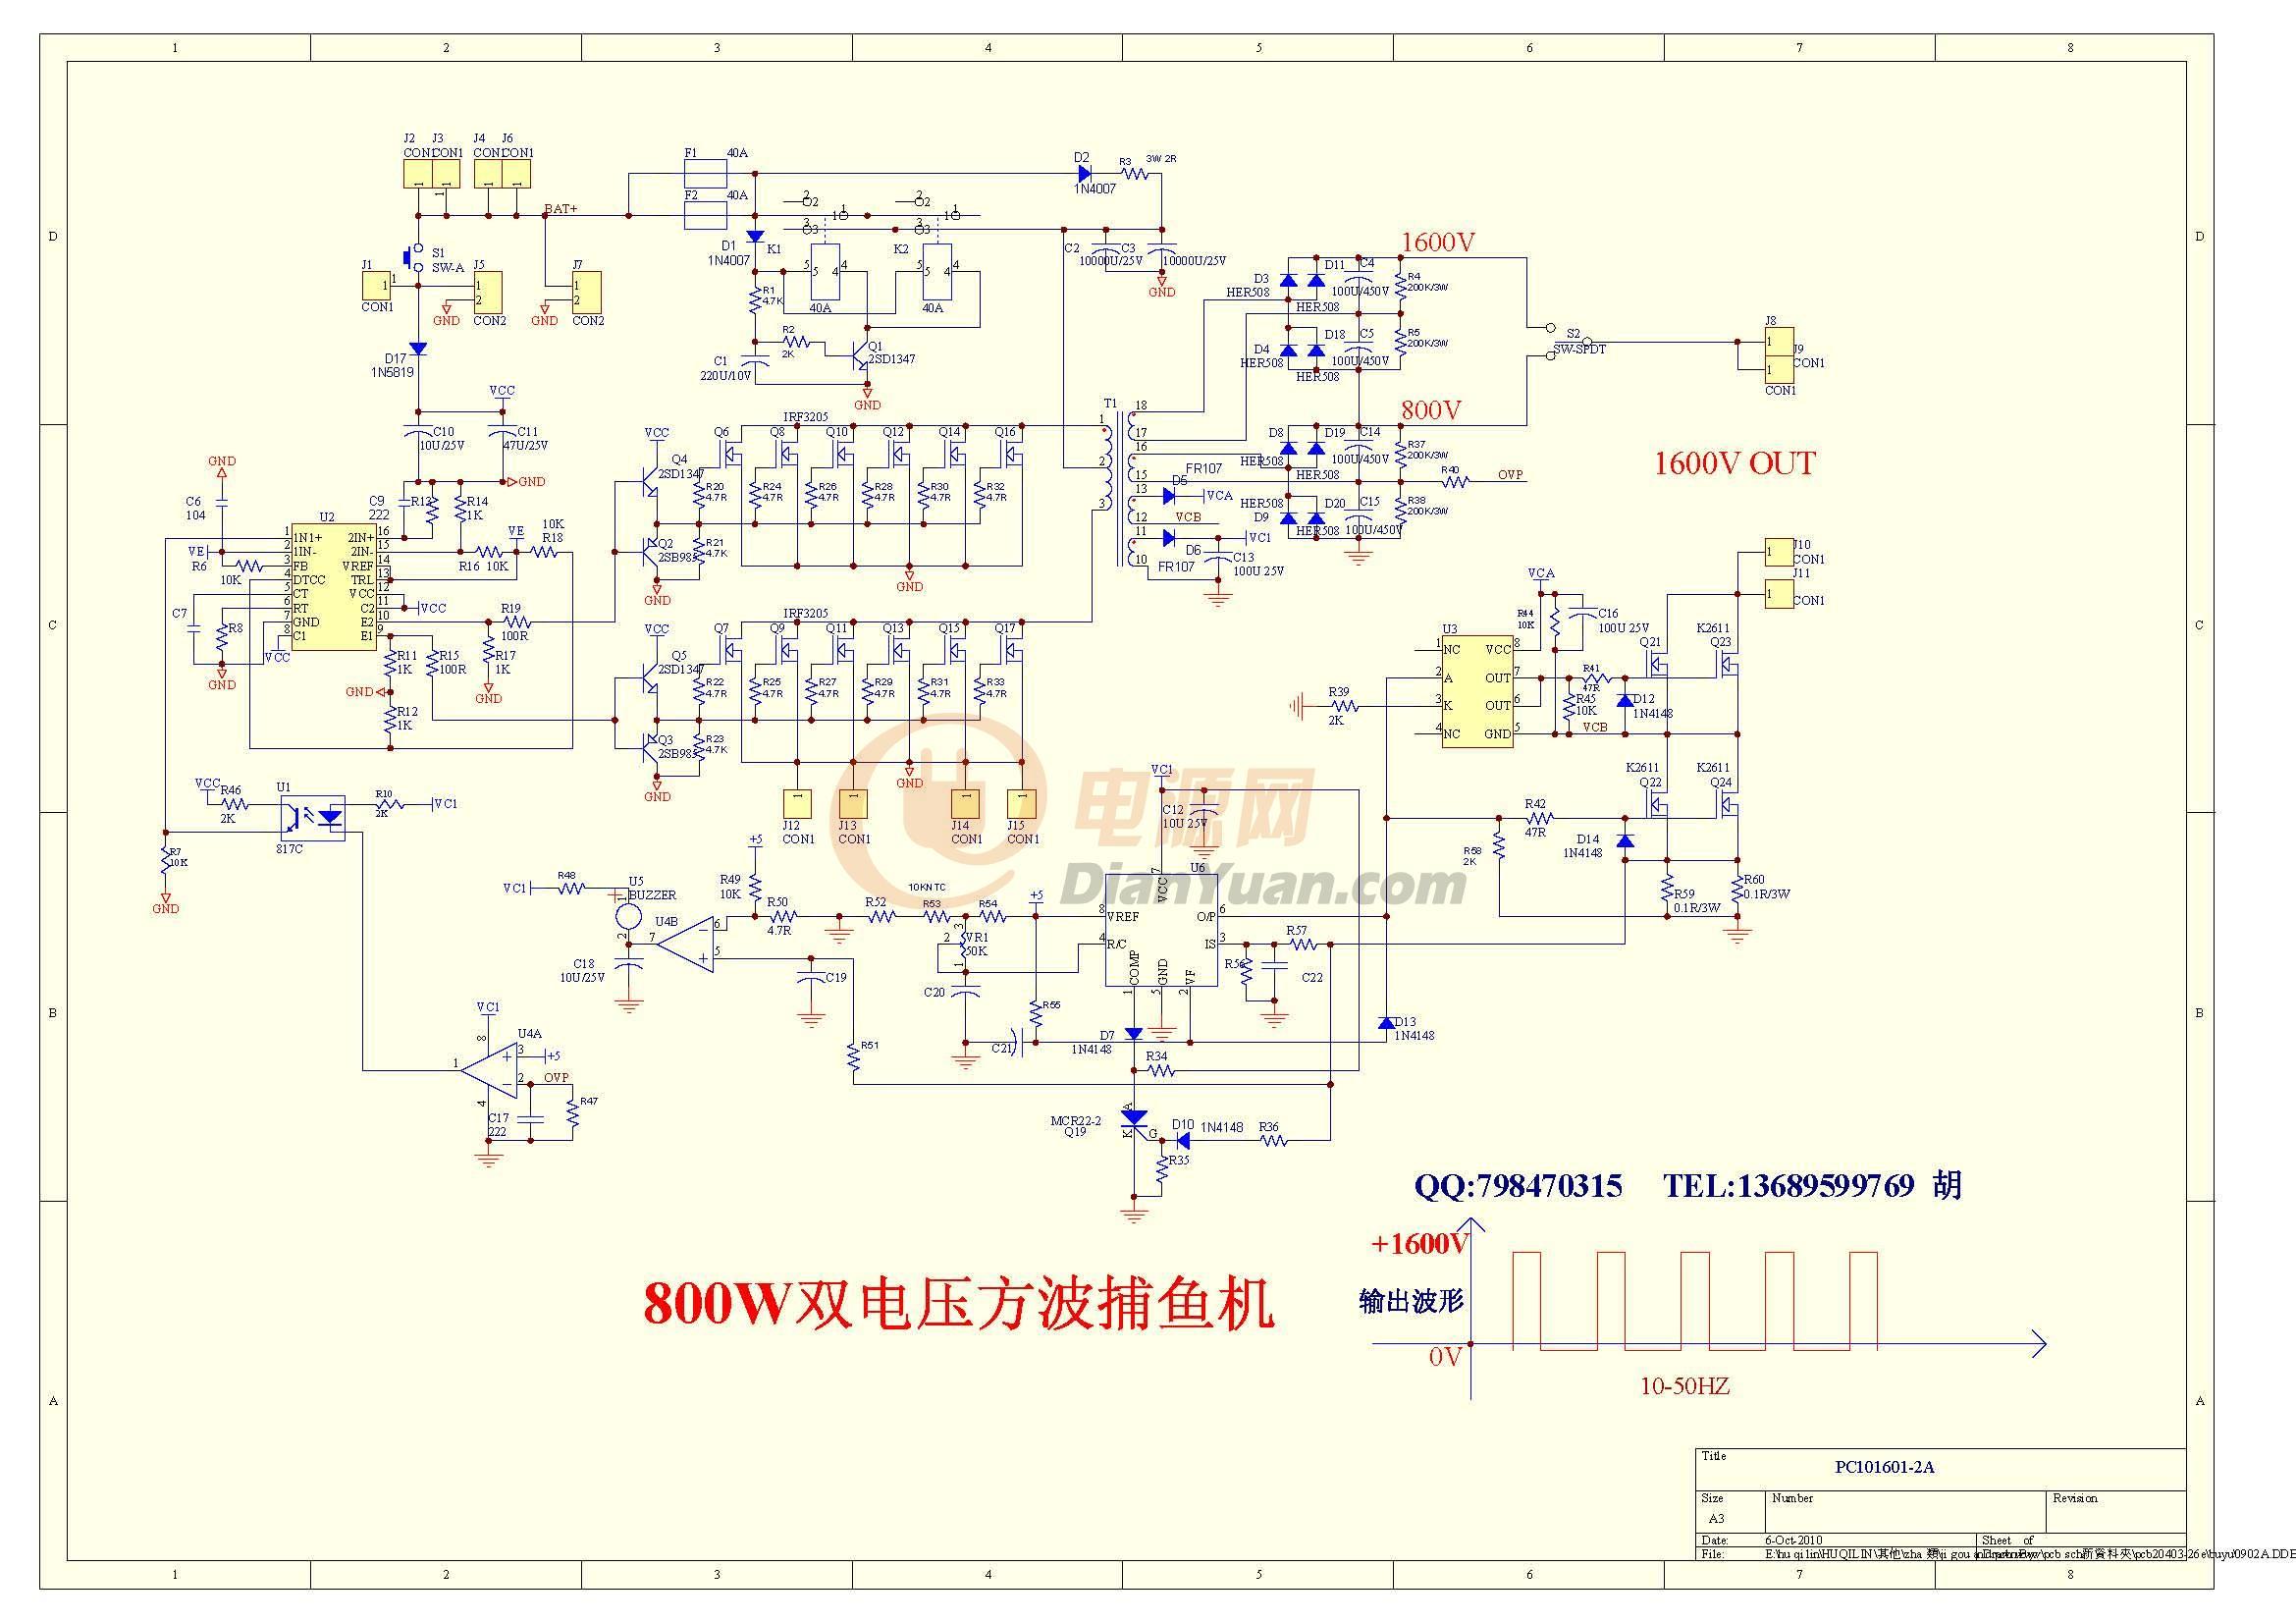 800w电子捕鱼器电路图;